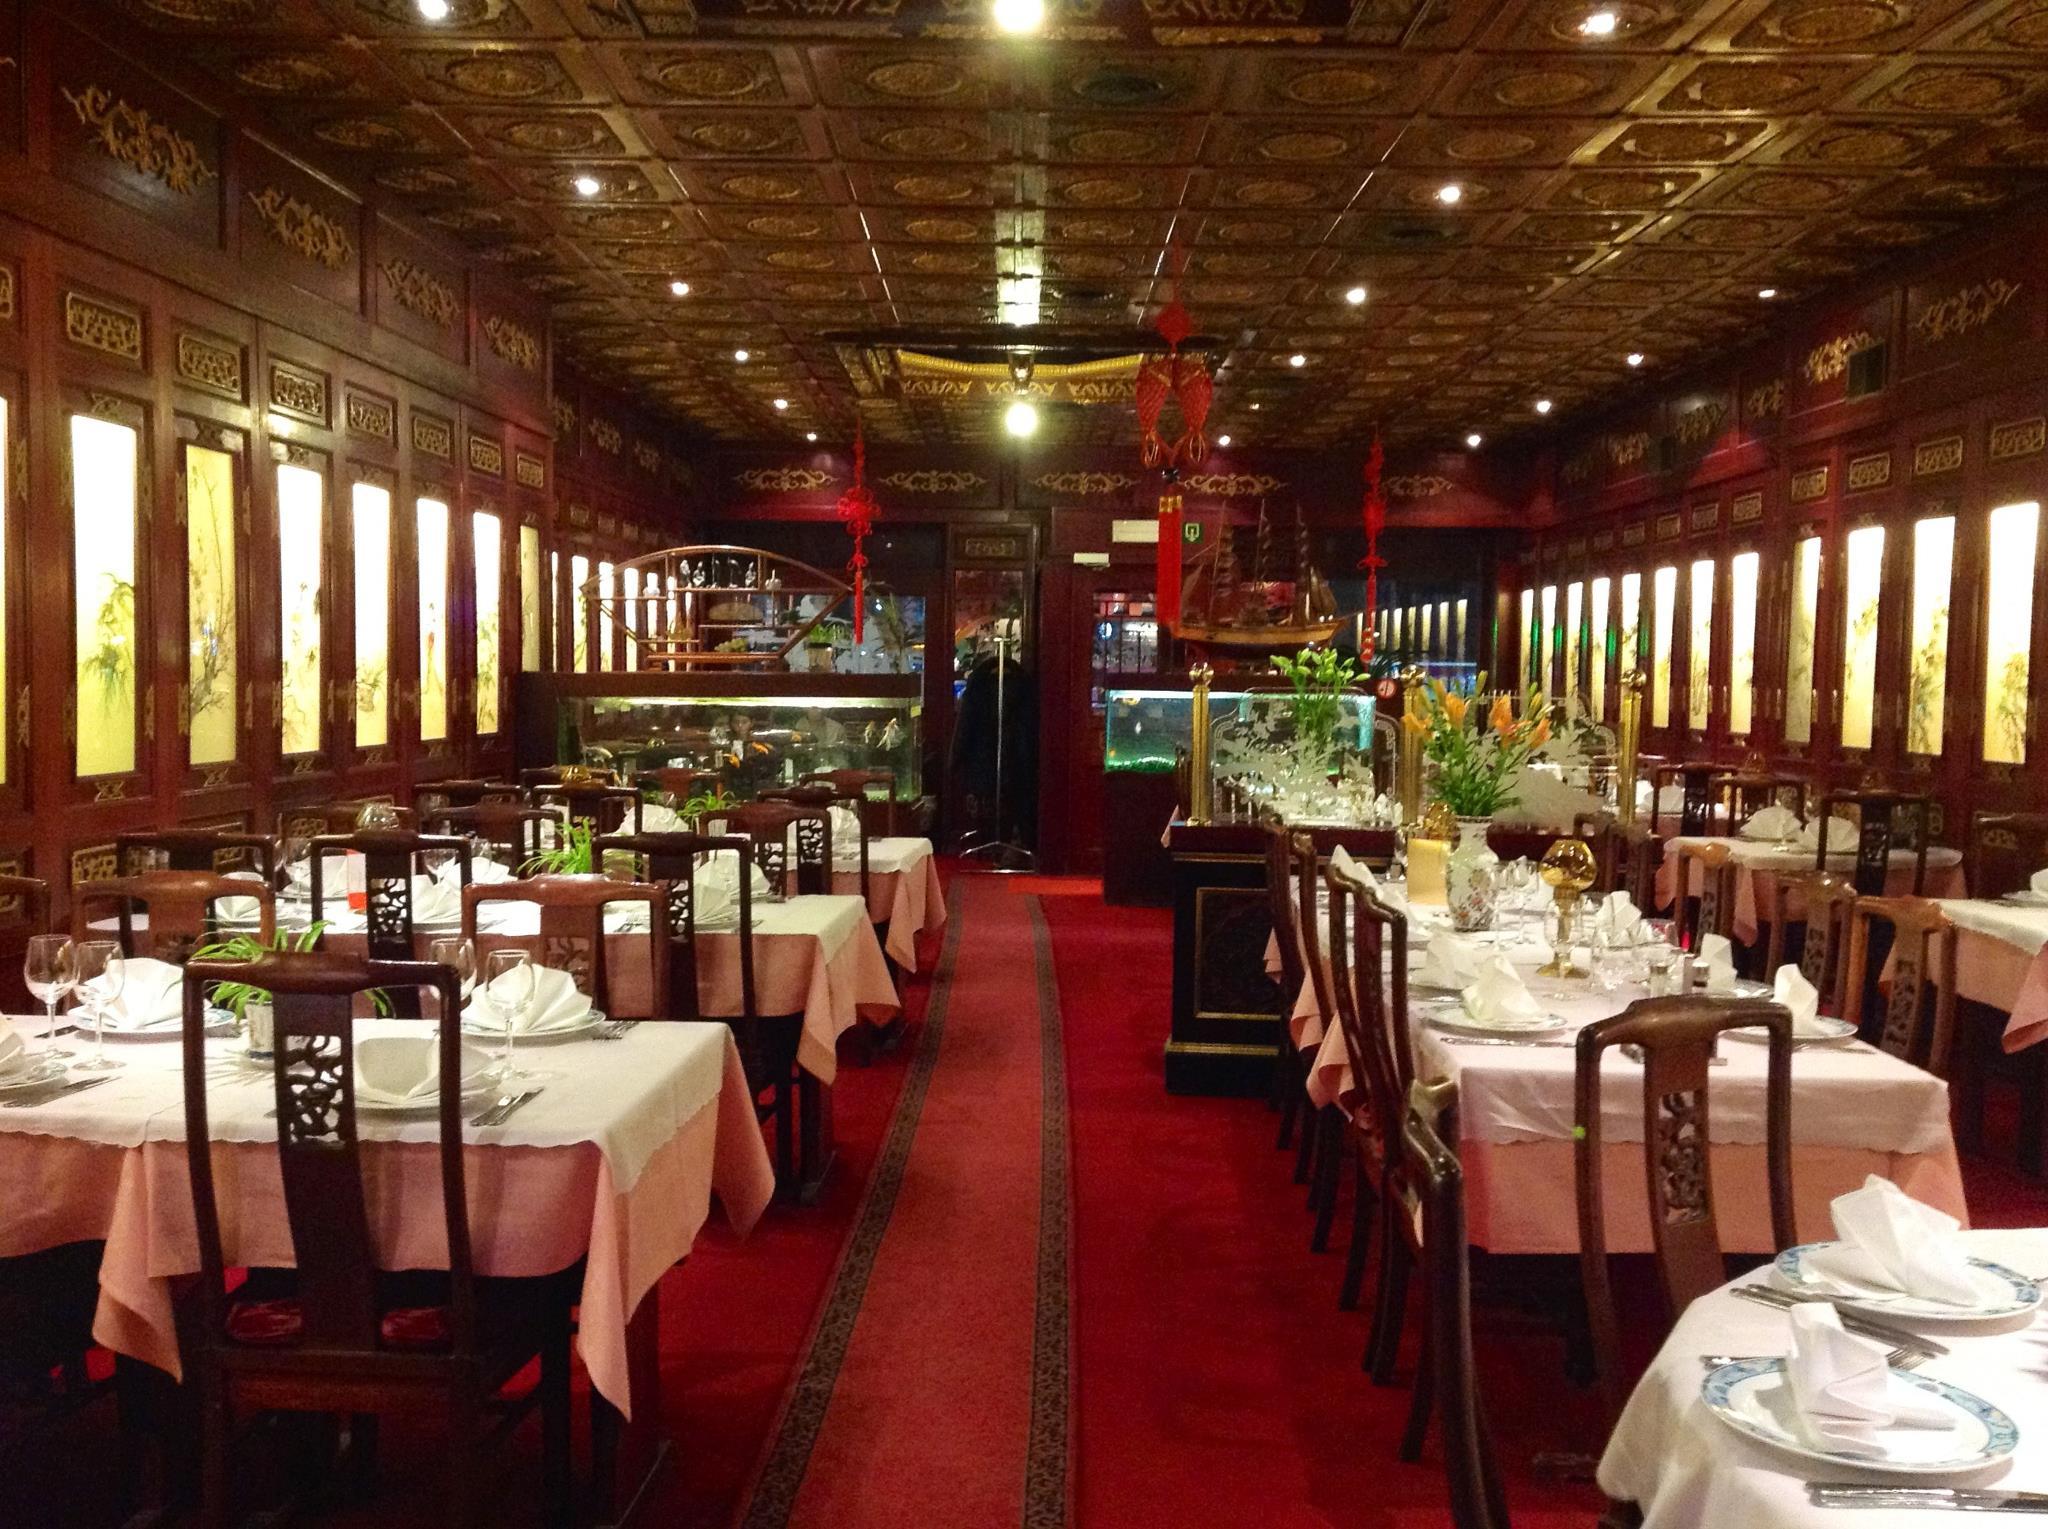 https://i1.wp.com/www.restaurant-china.be/wp-content/uploads/2015/09/interieur-restaurant-china.jpg?ssl=1